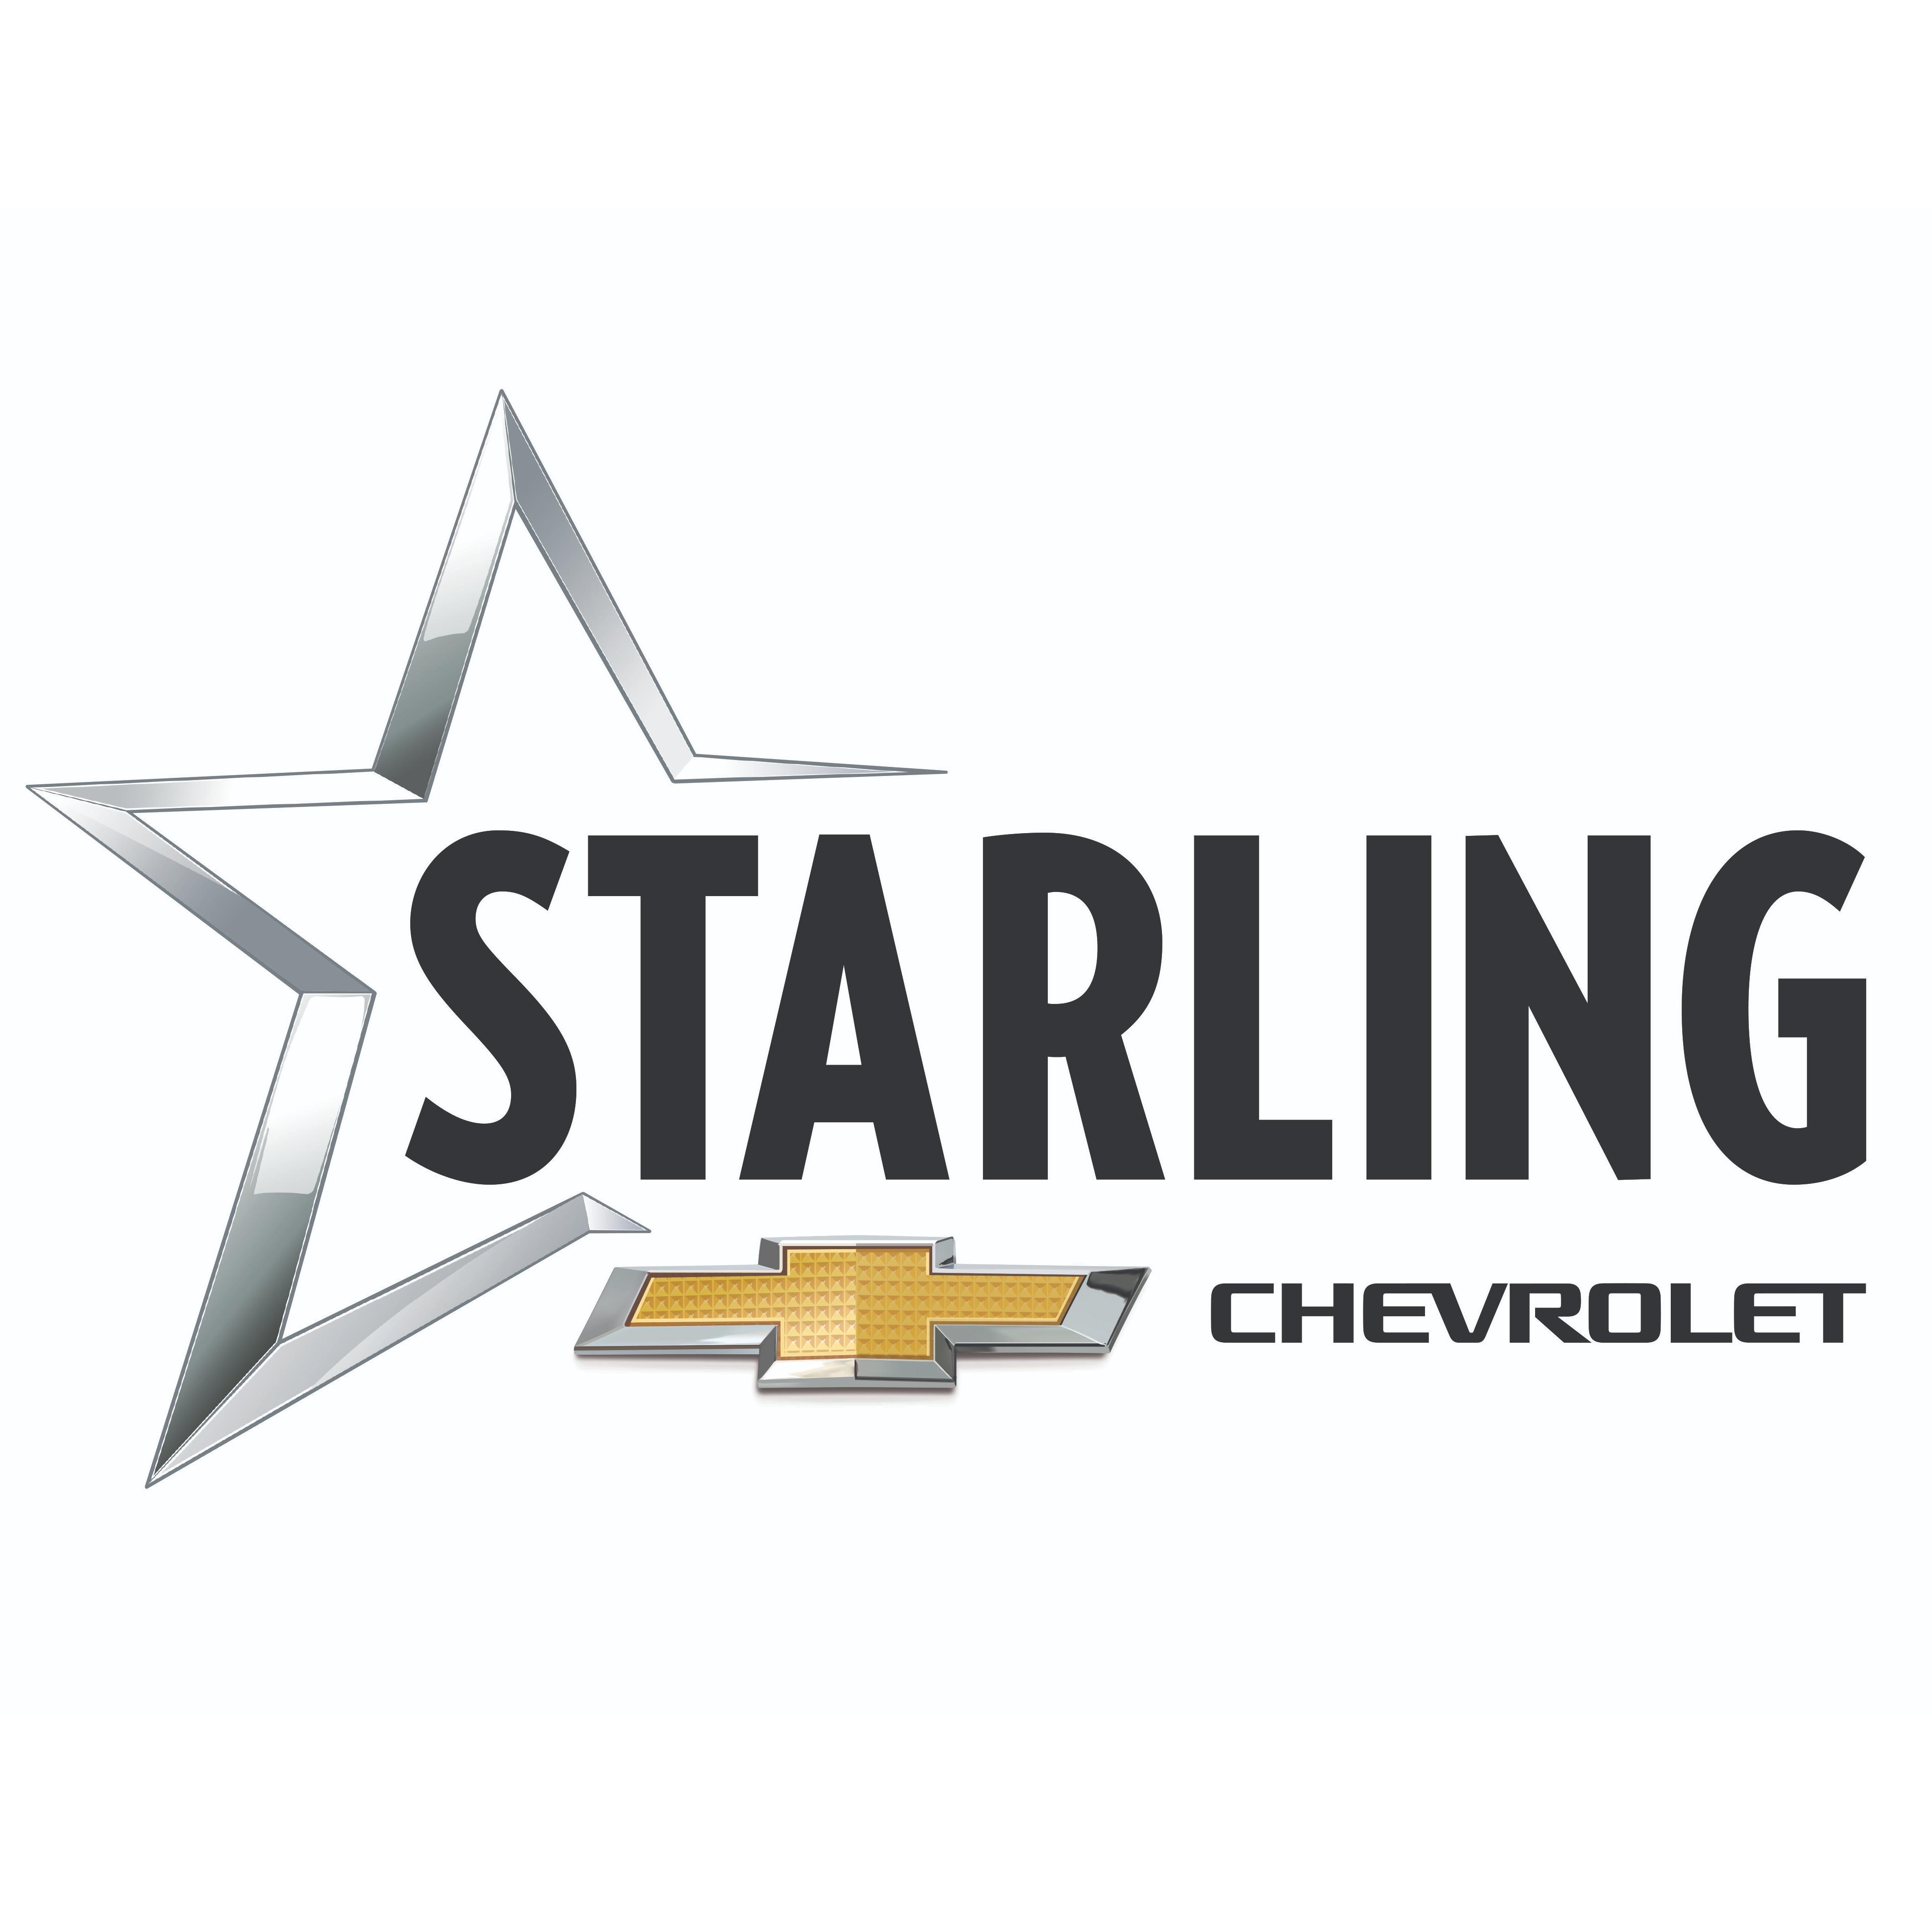 Starling Chevrolet image 1